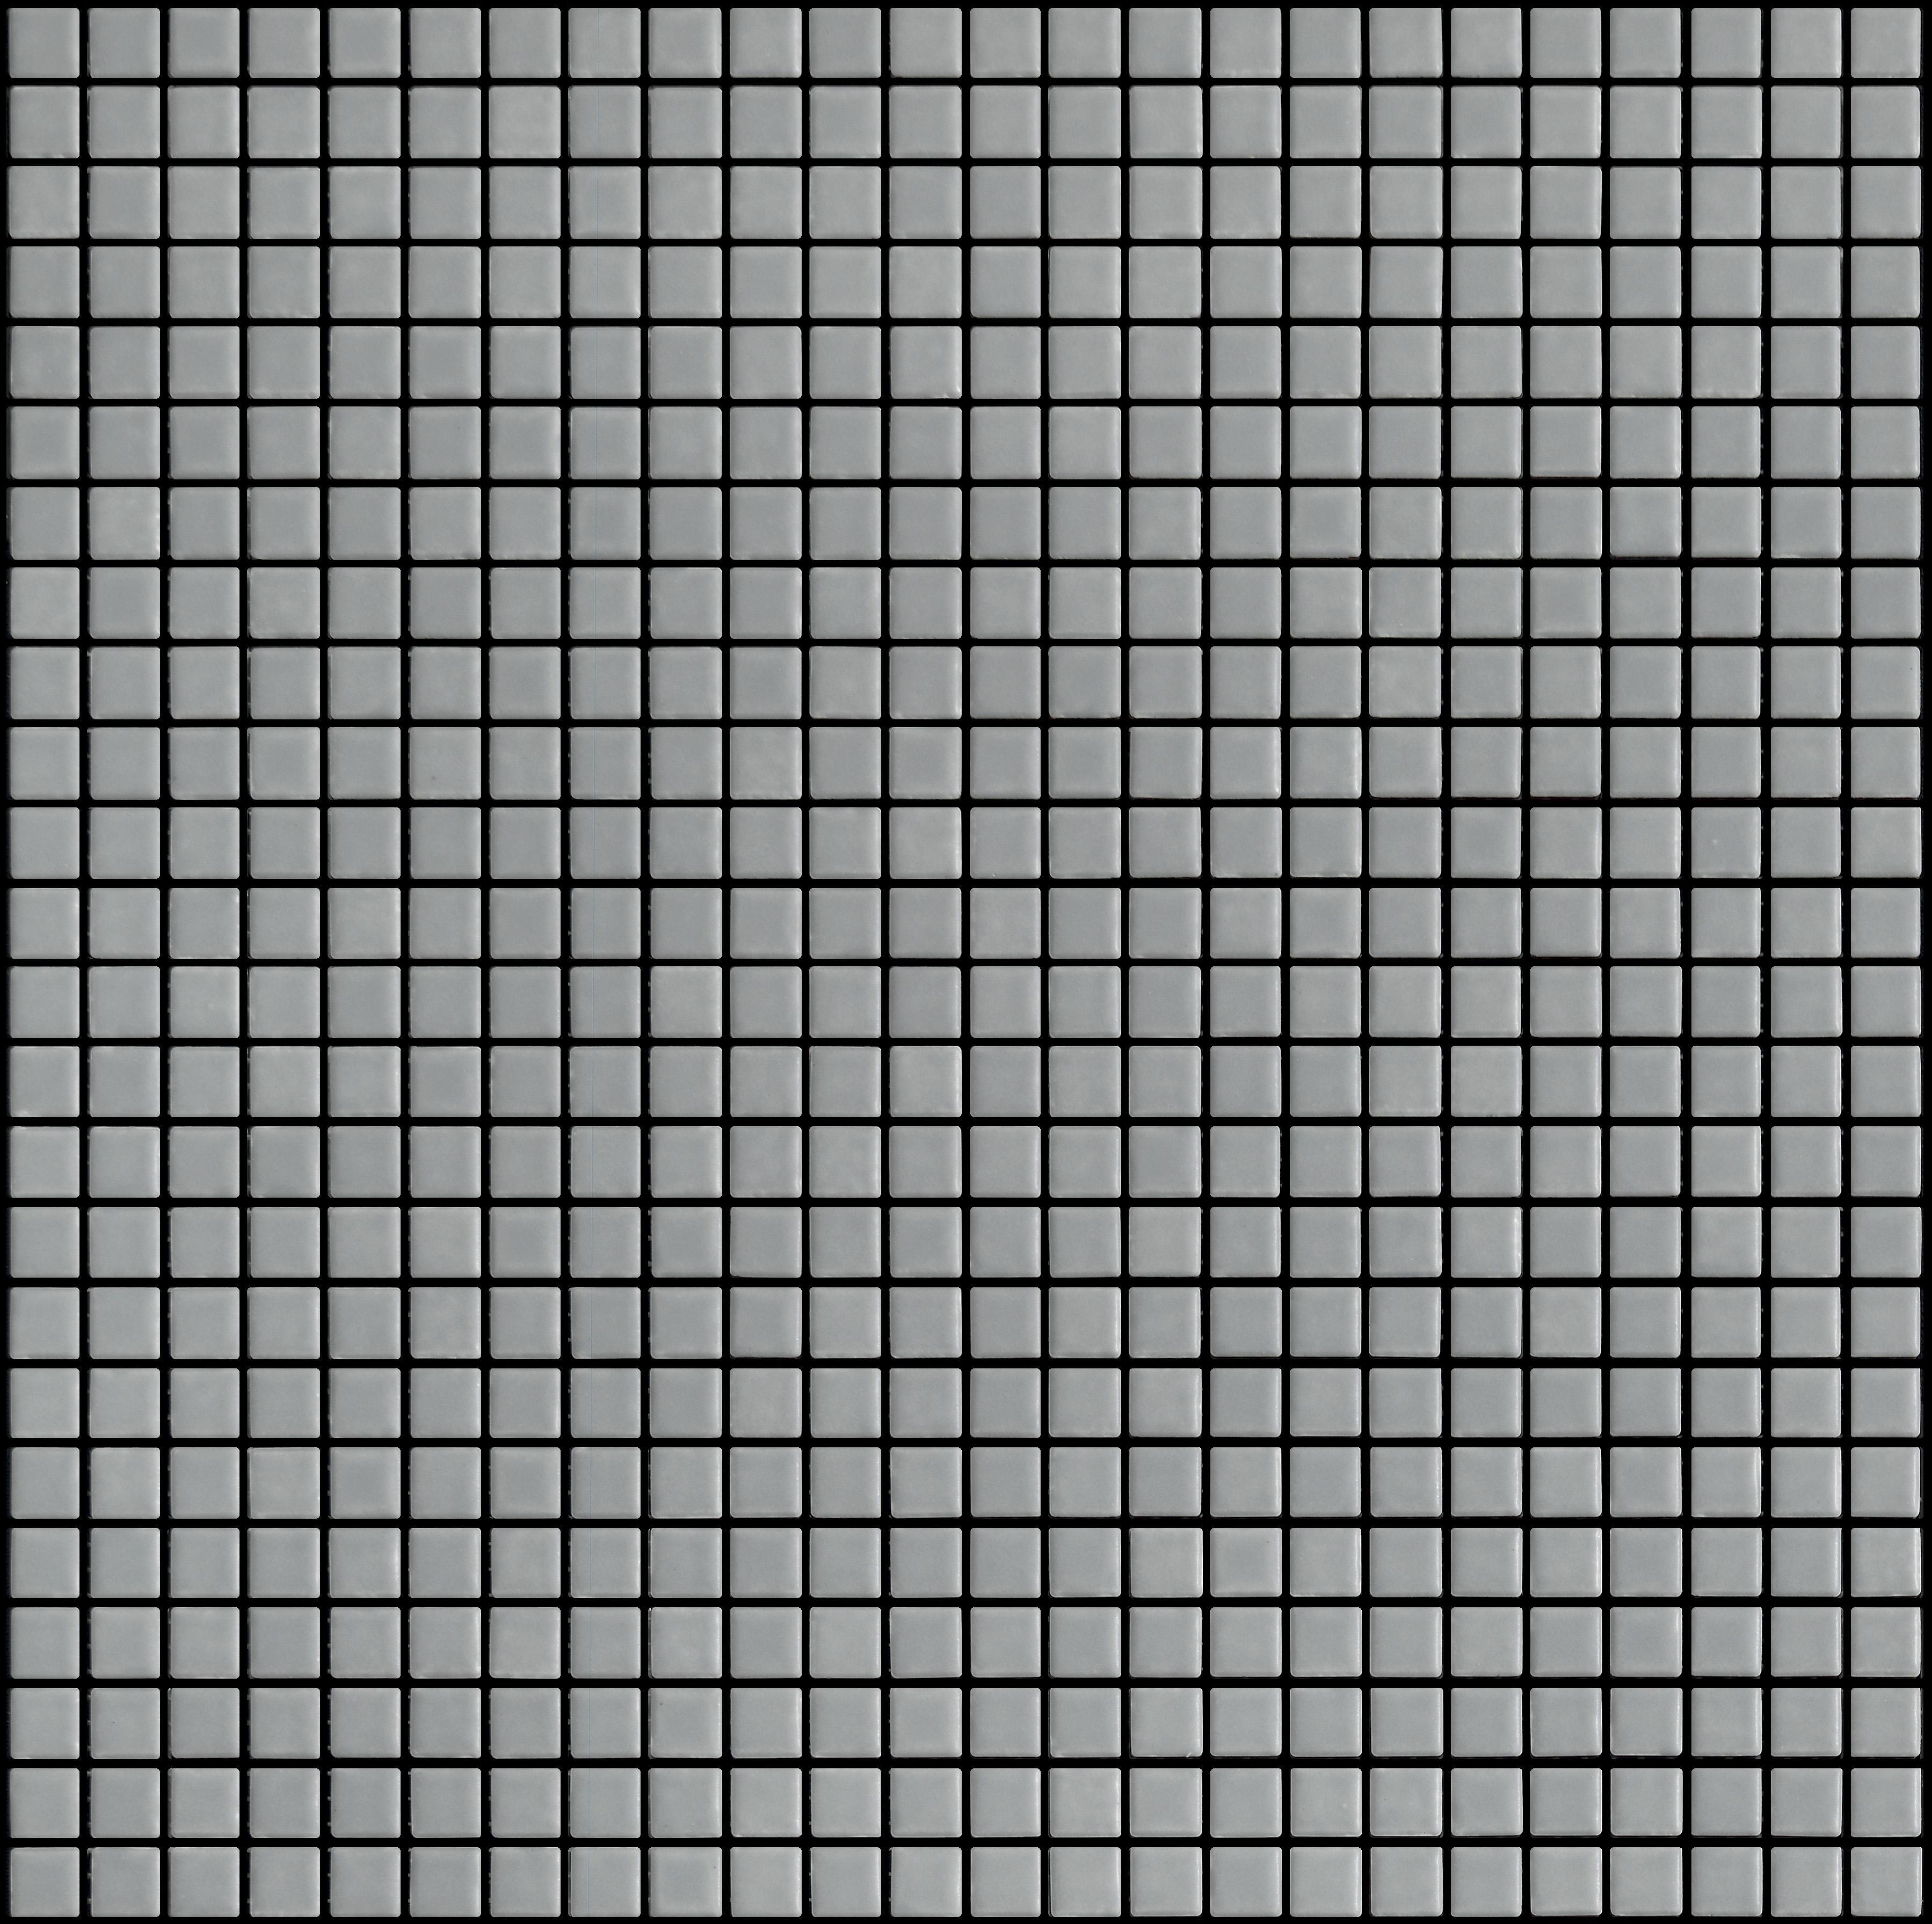 Seta 1,2x1,2